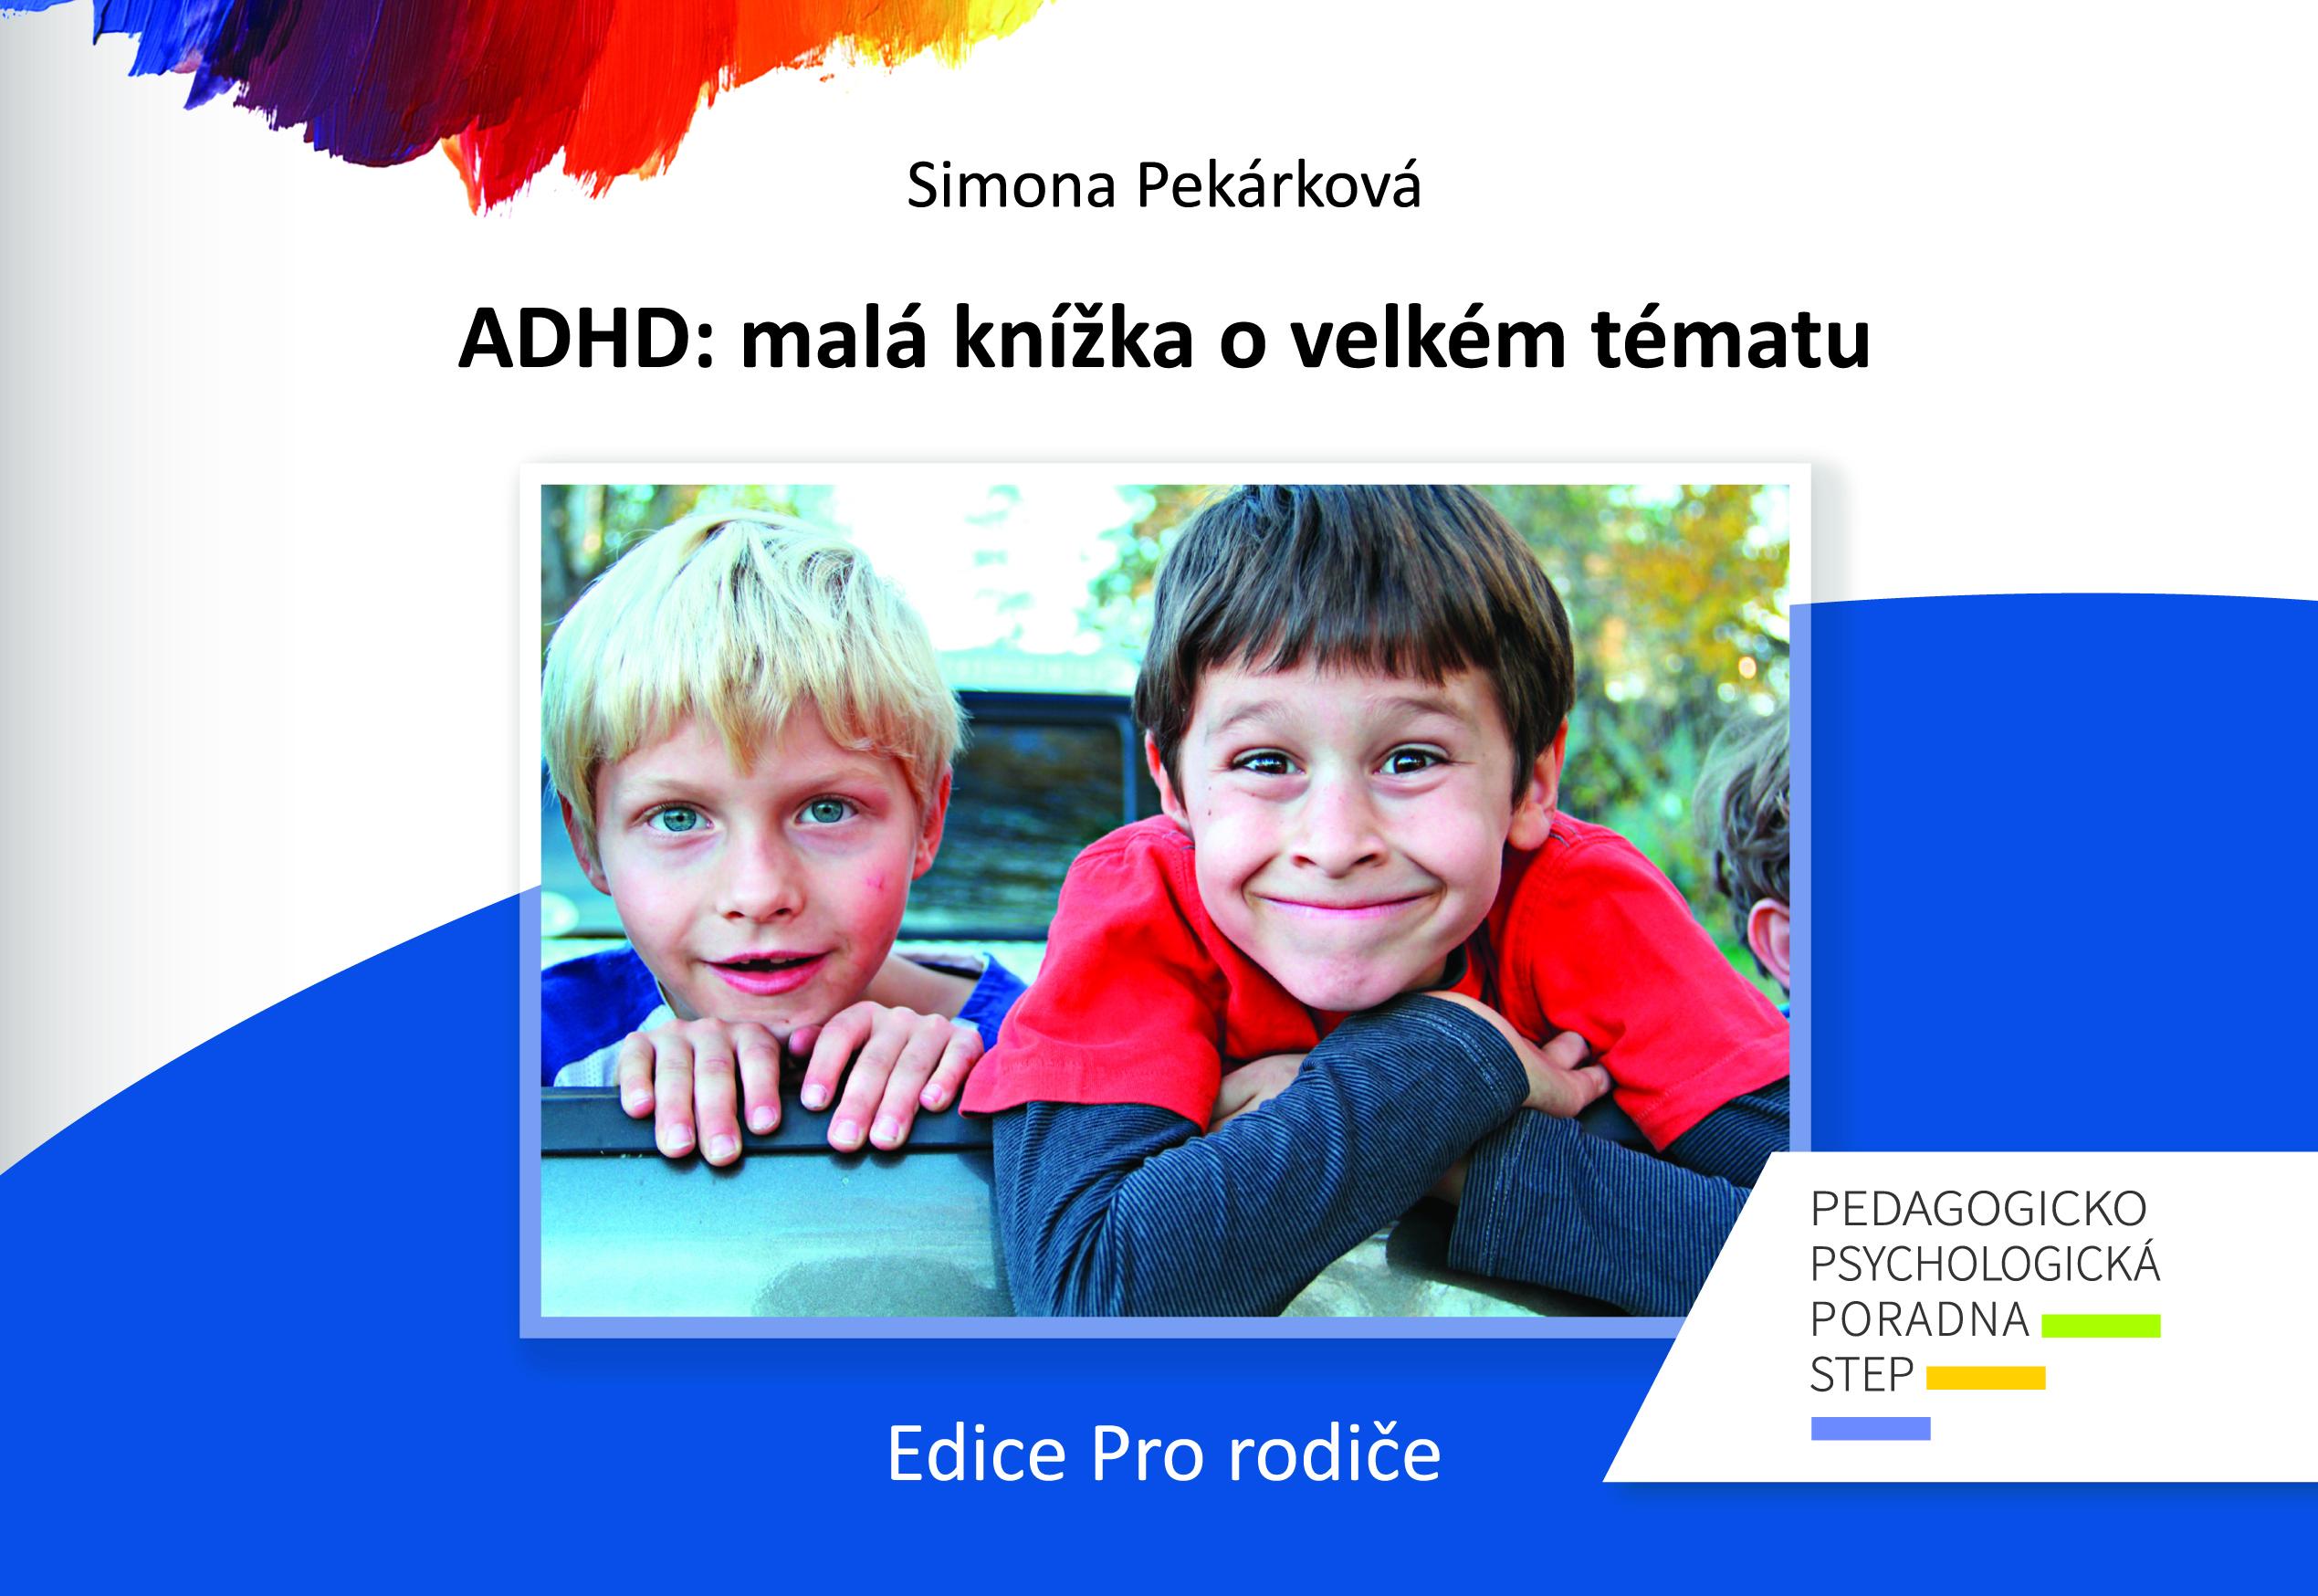 ADHD: malá kniha o velkém tématu